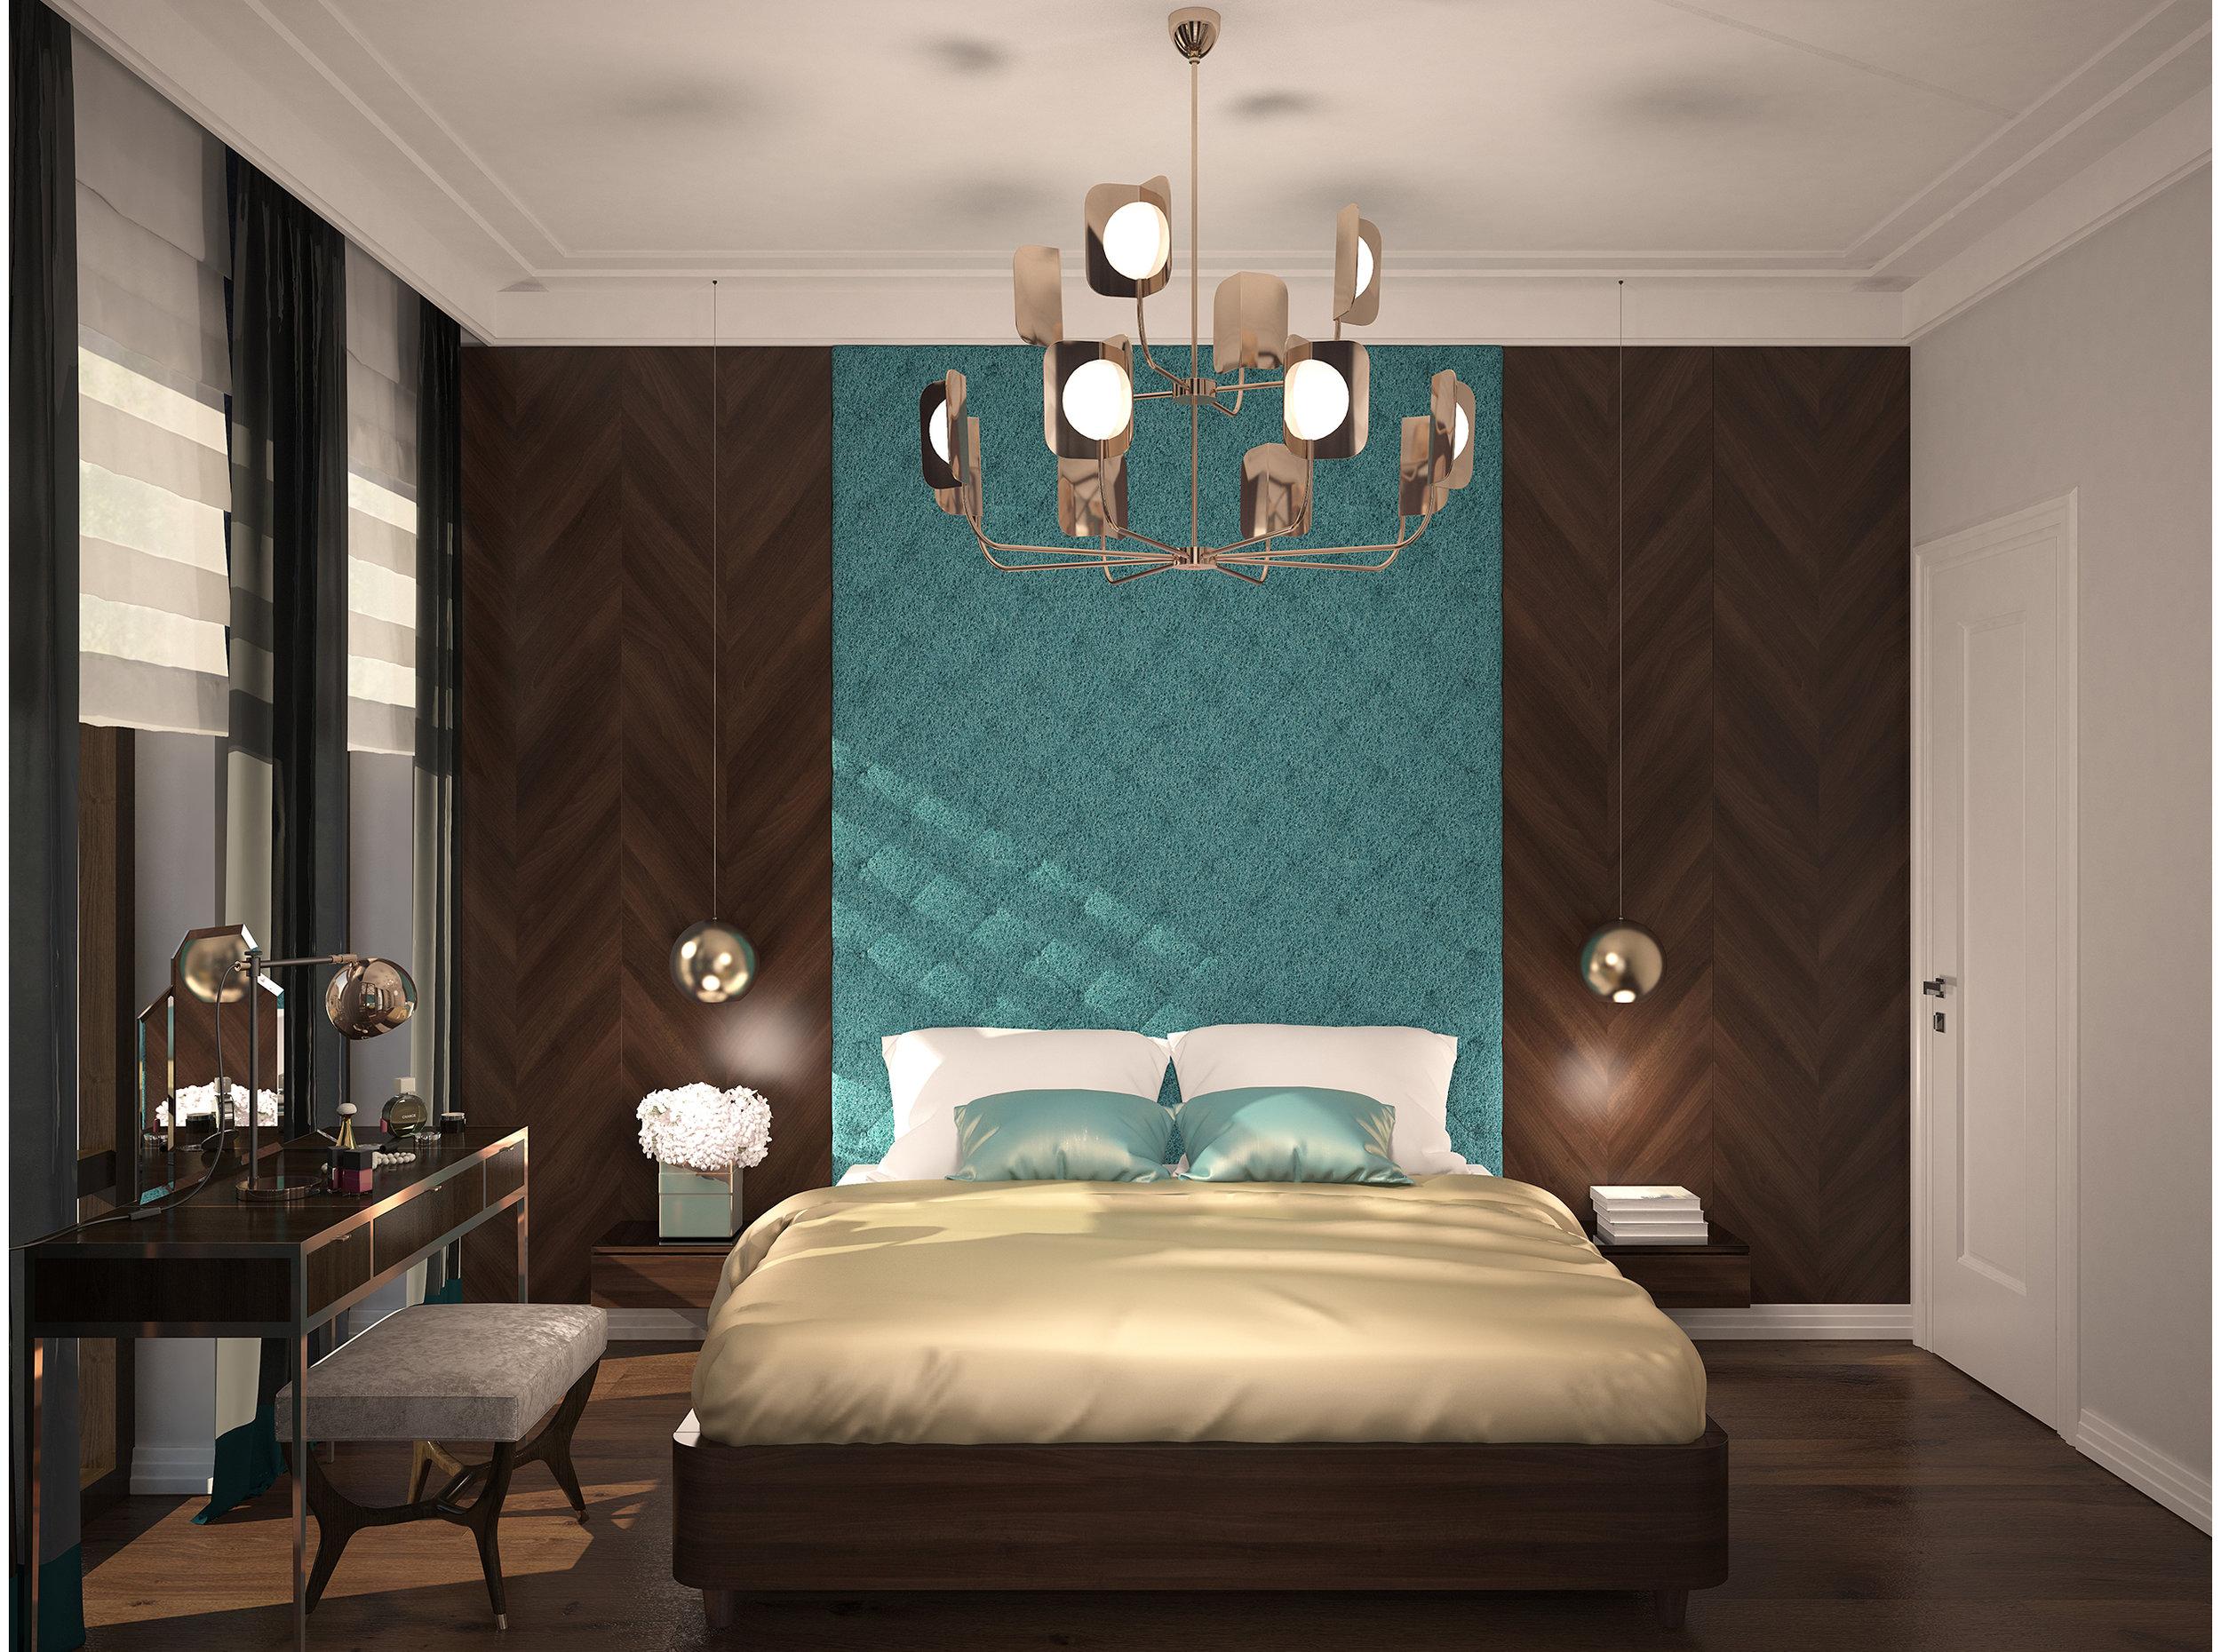 Copy of Bedroom interior art deco style